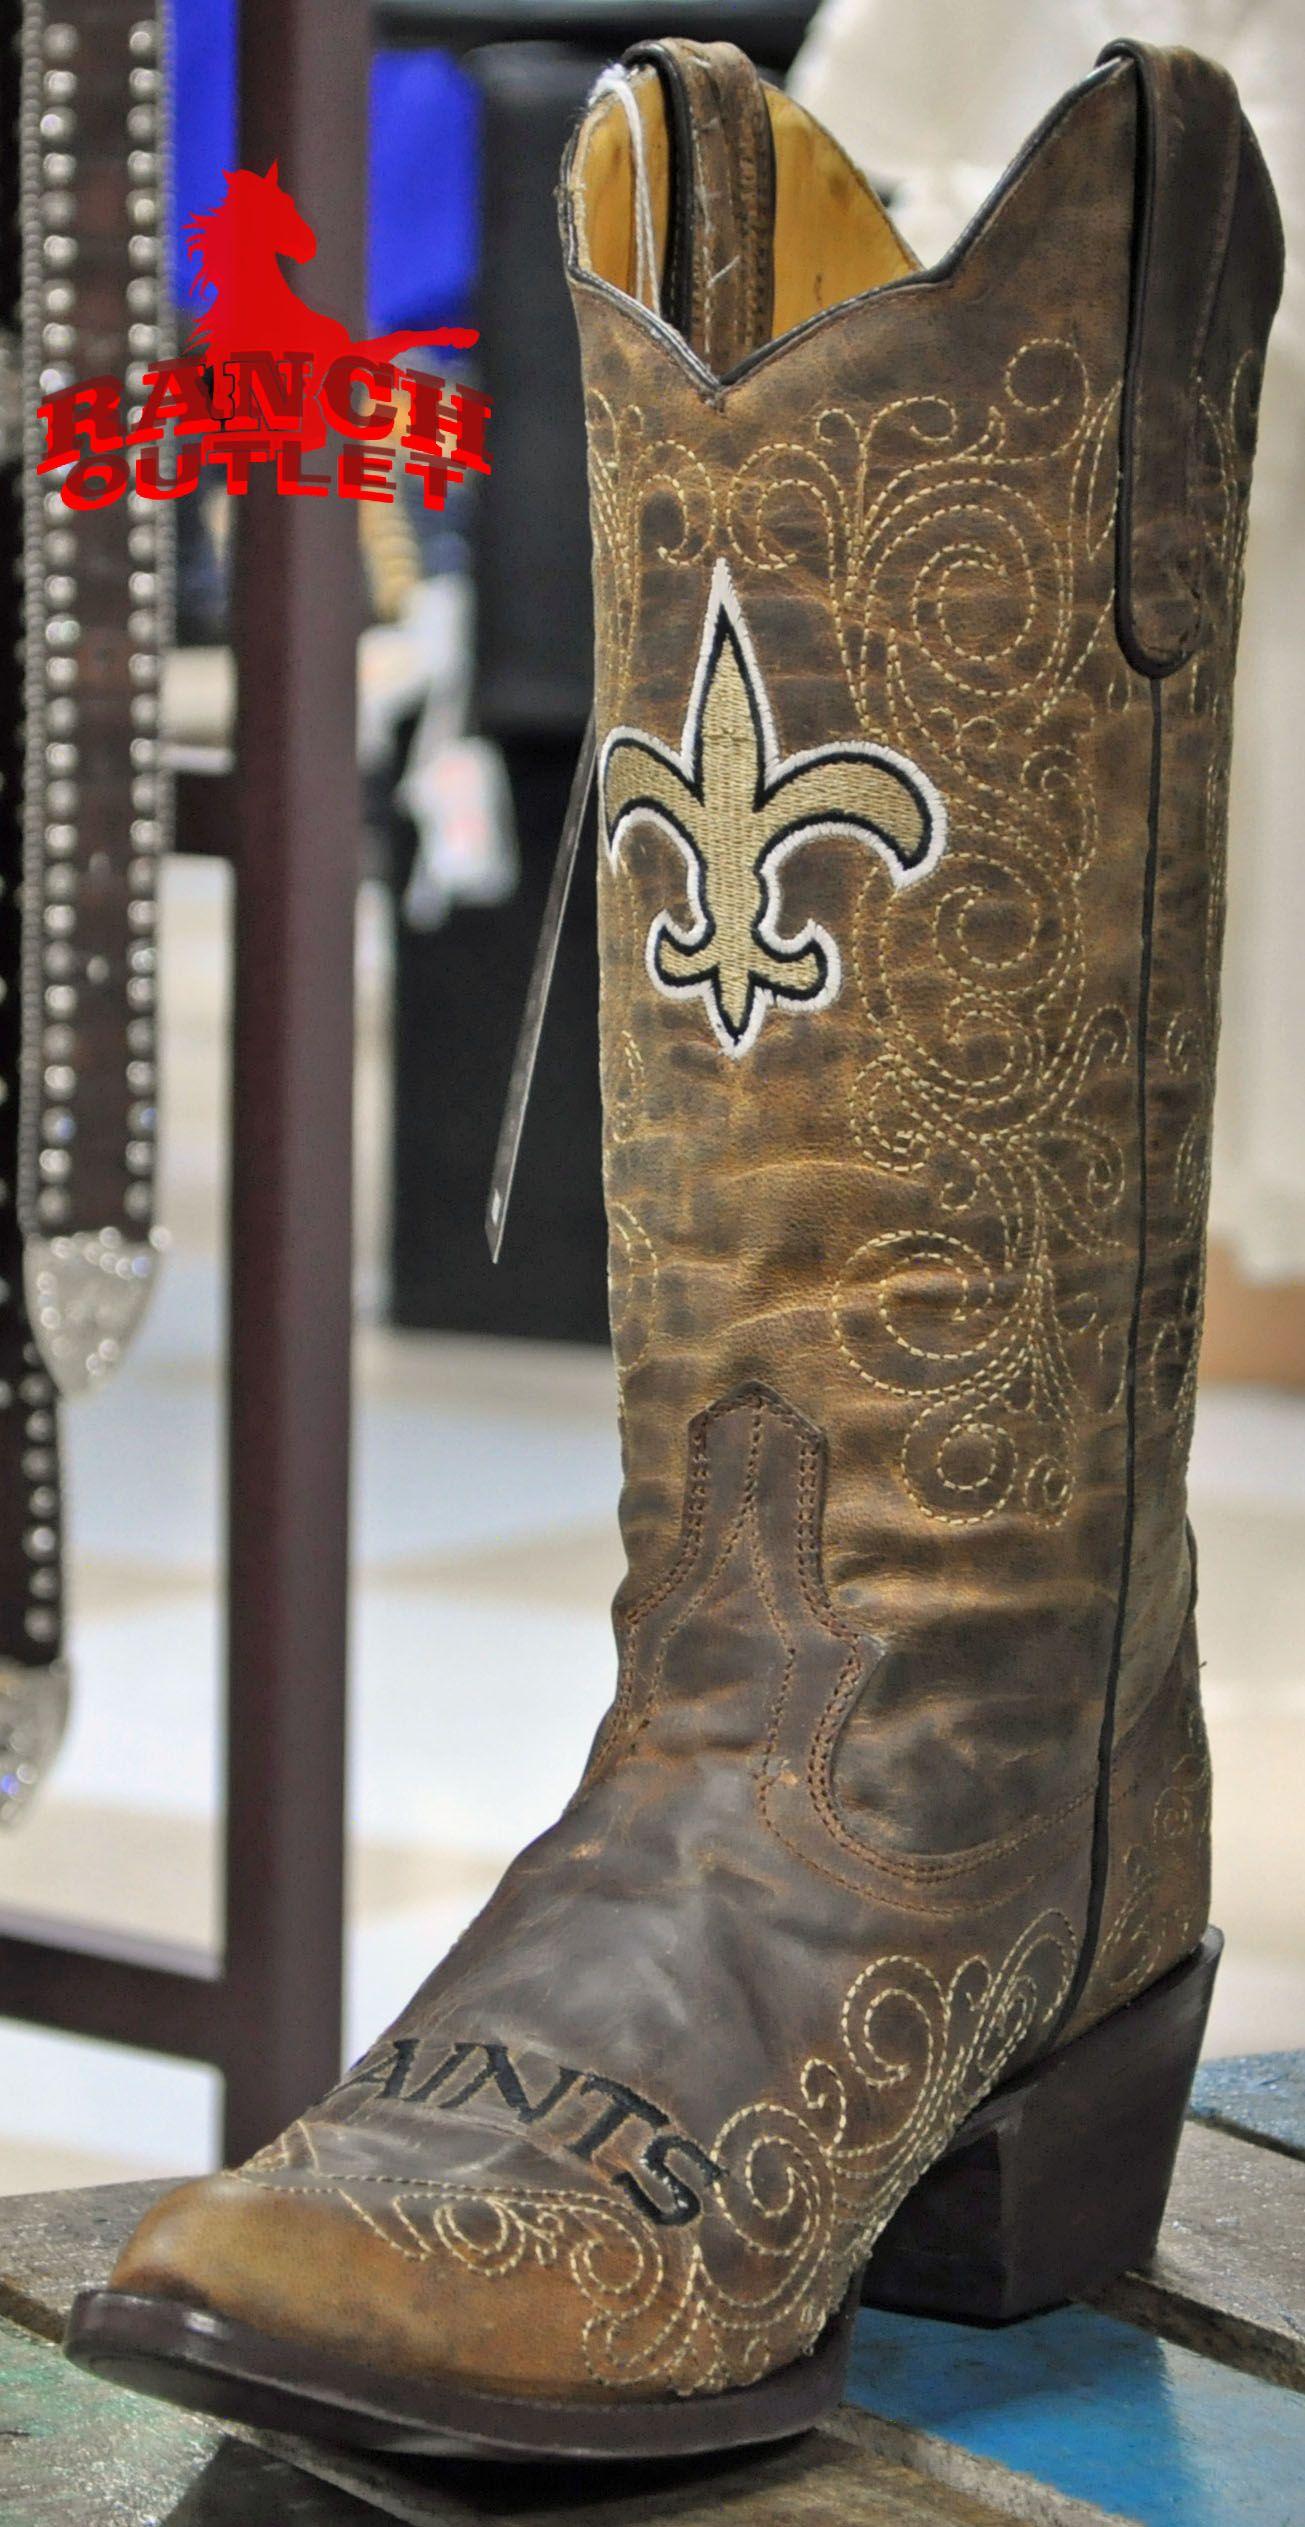 9729553d New Orleans Saints Cowboy boots @Shelly Credeur | Sports girl ...